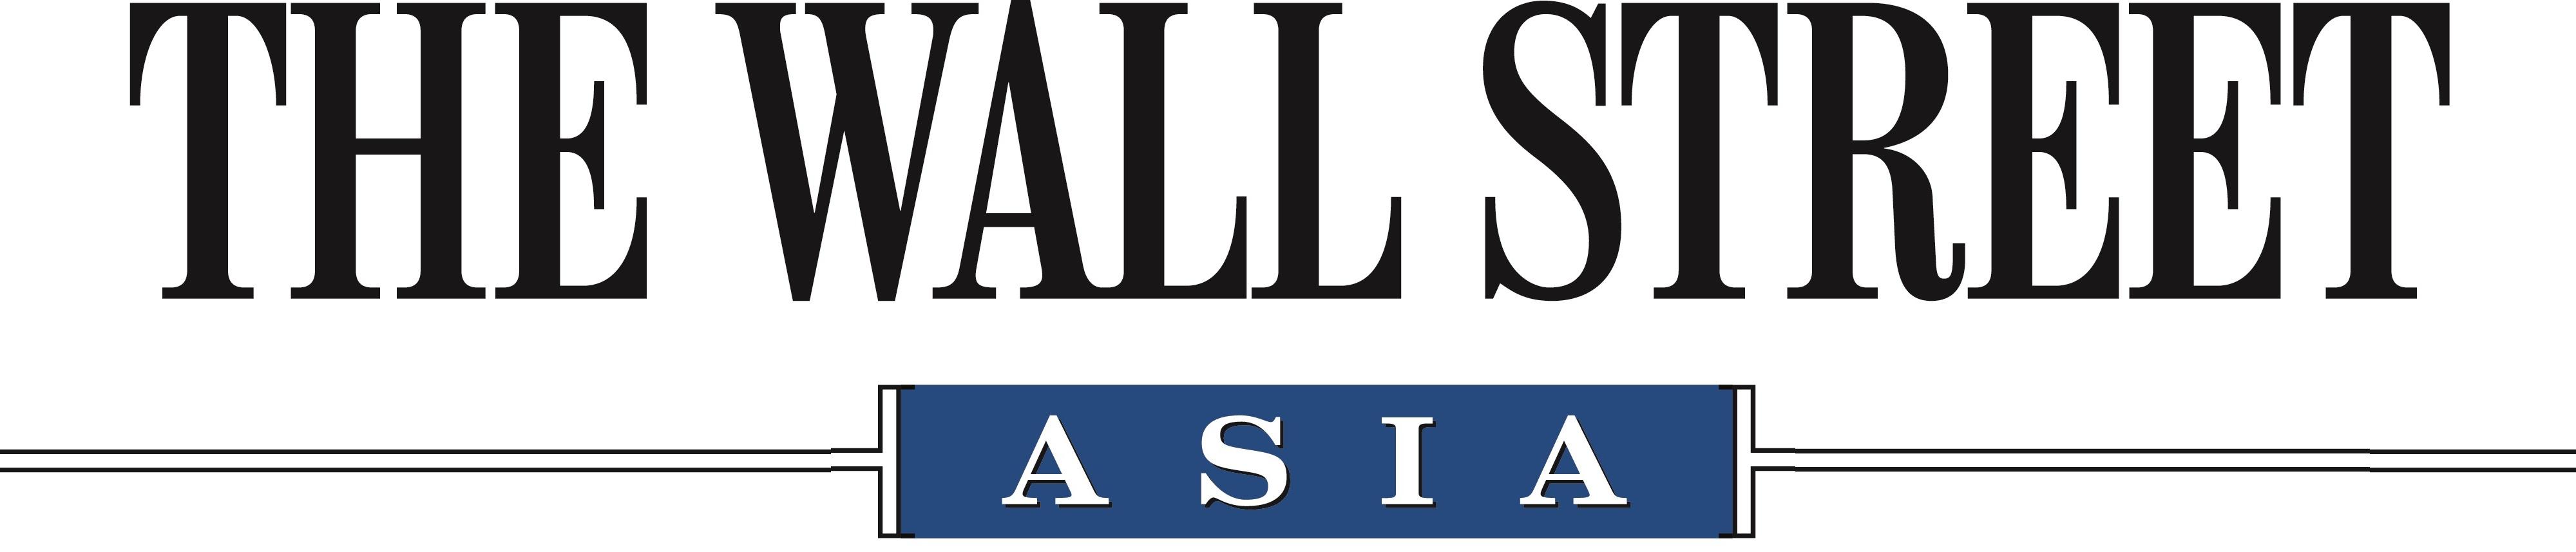 Wall Street Asia